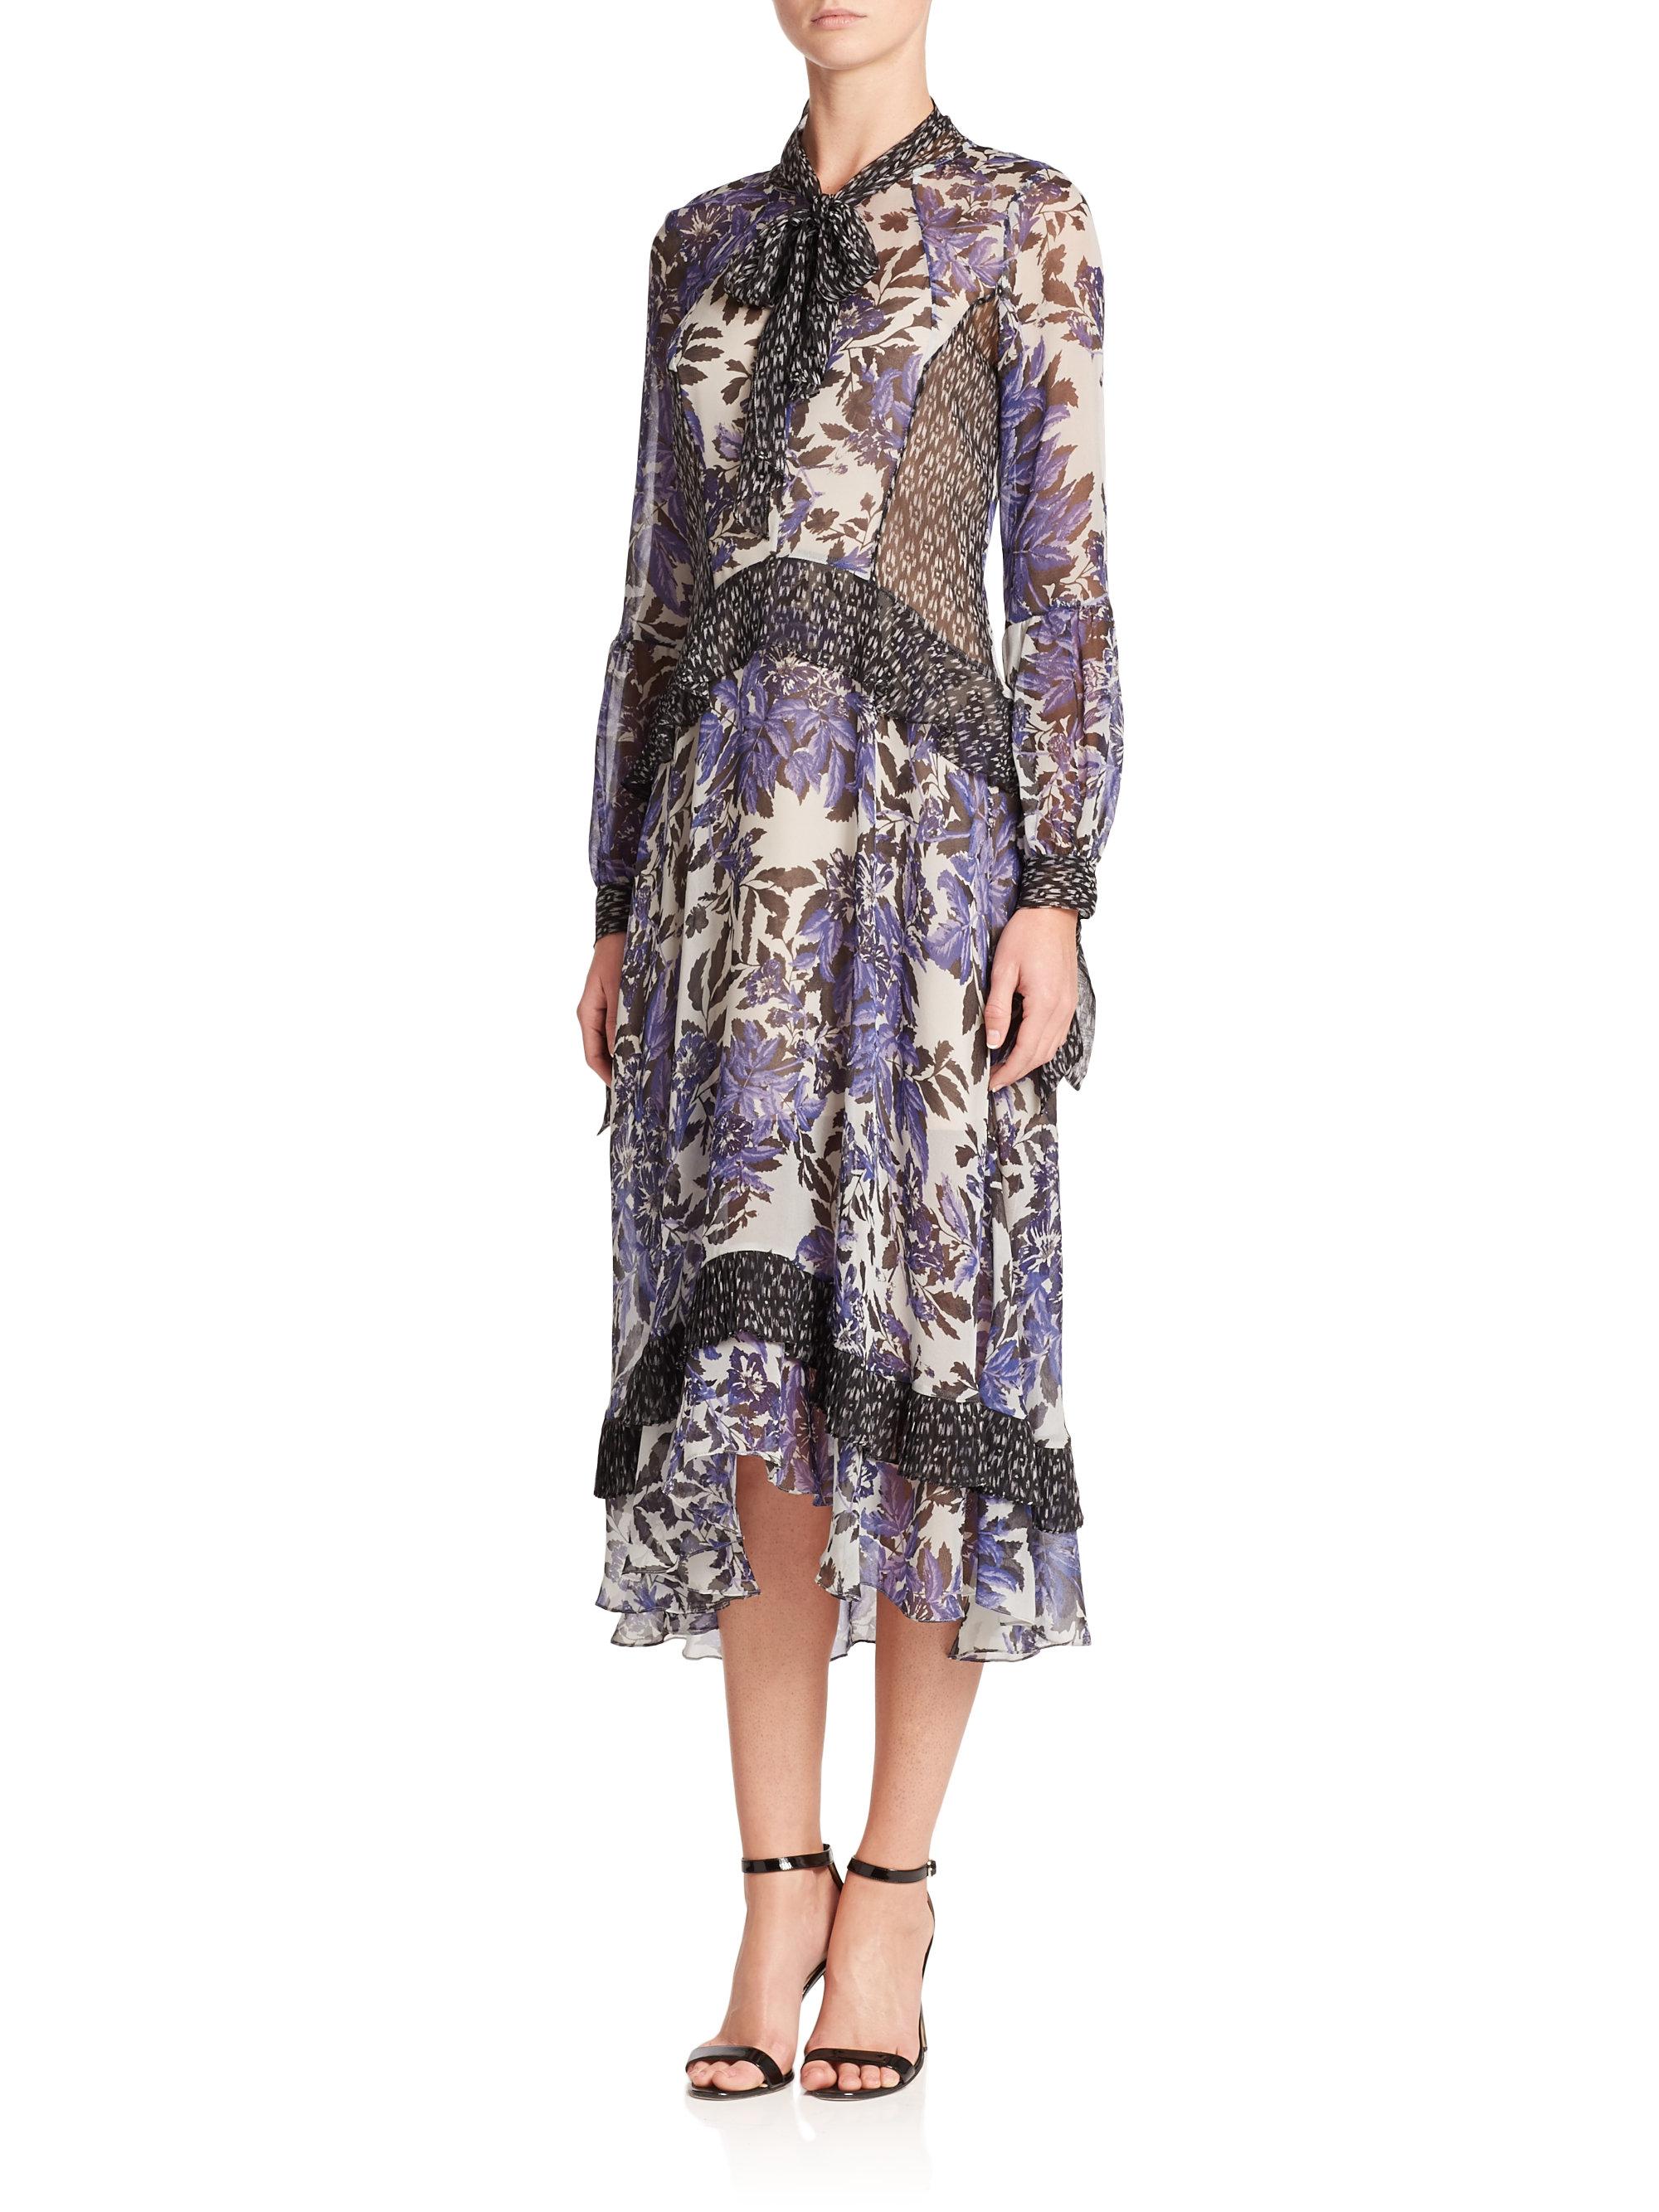 Buy Newest Buy Cheap Classic V-neck ruffle silk dress Rebecca Taylor Cheap Sale Browse 2ALgkT